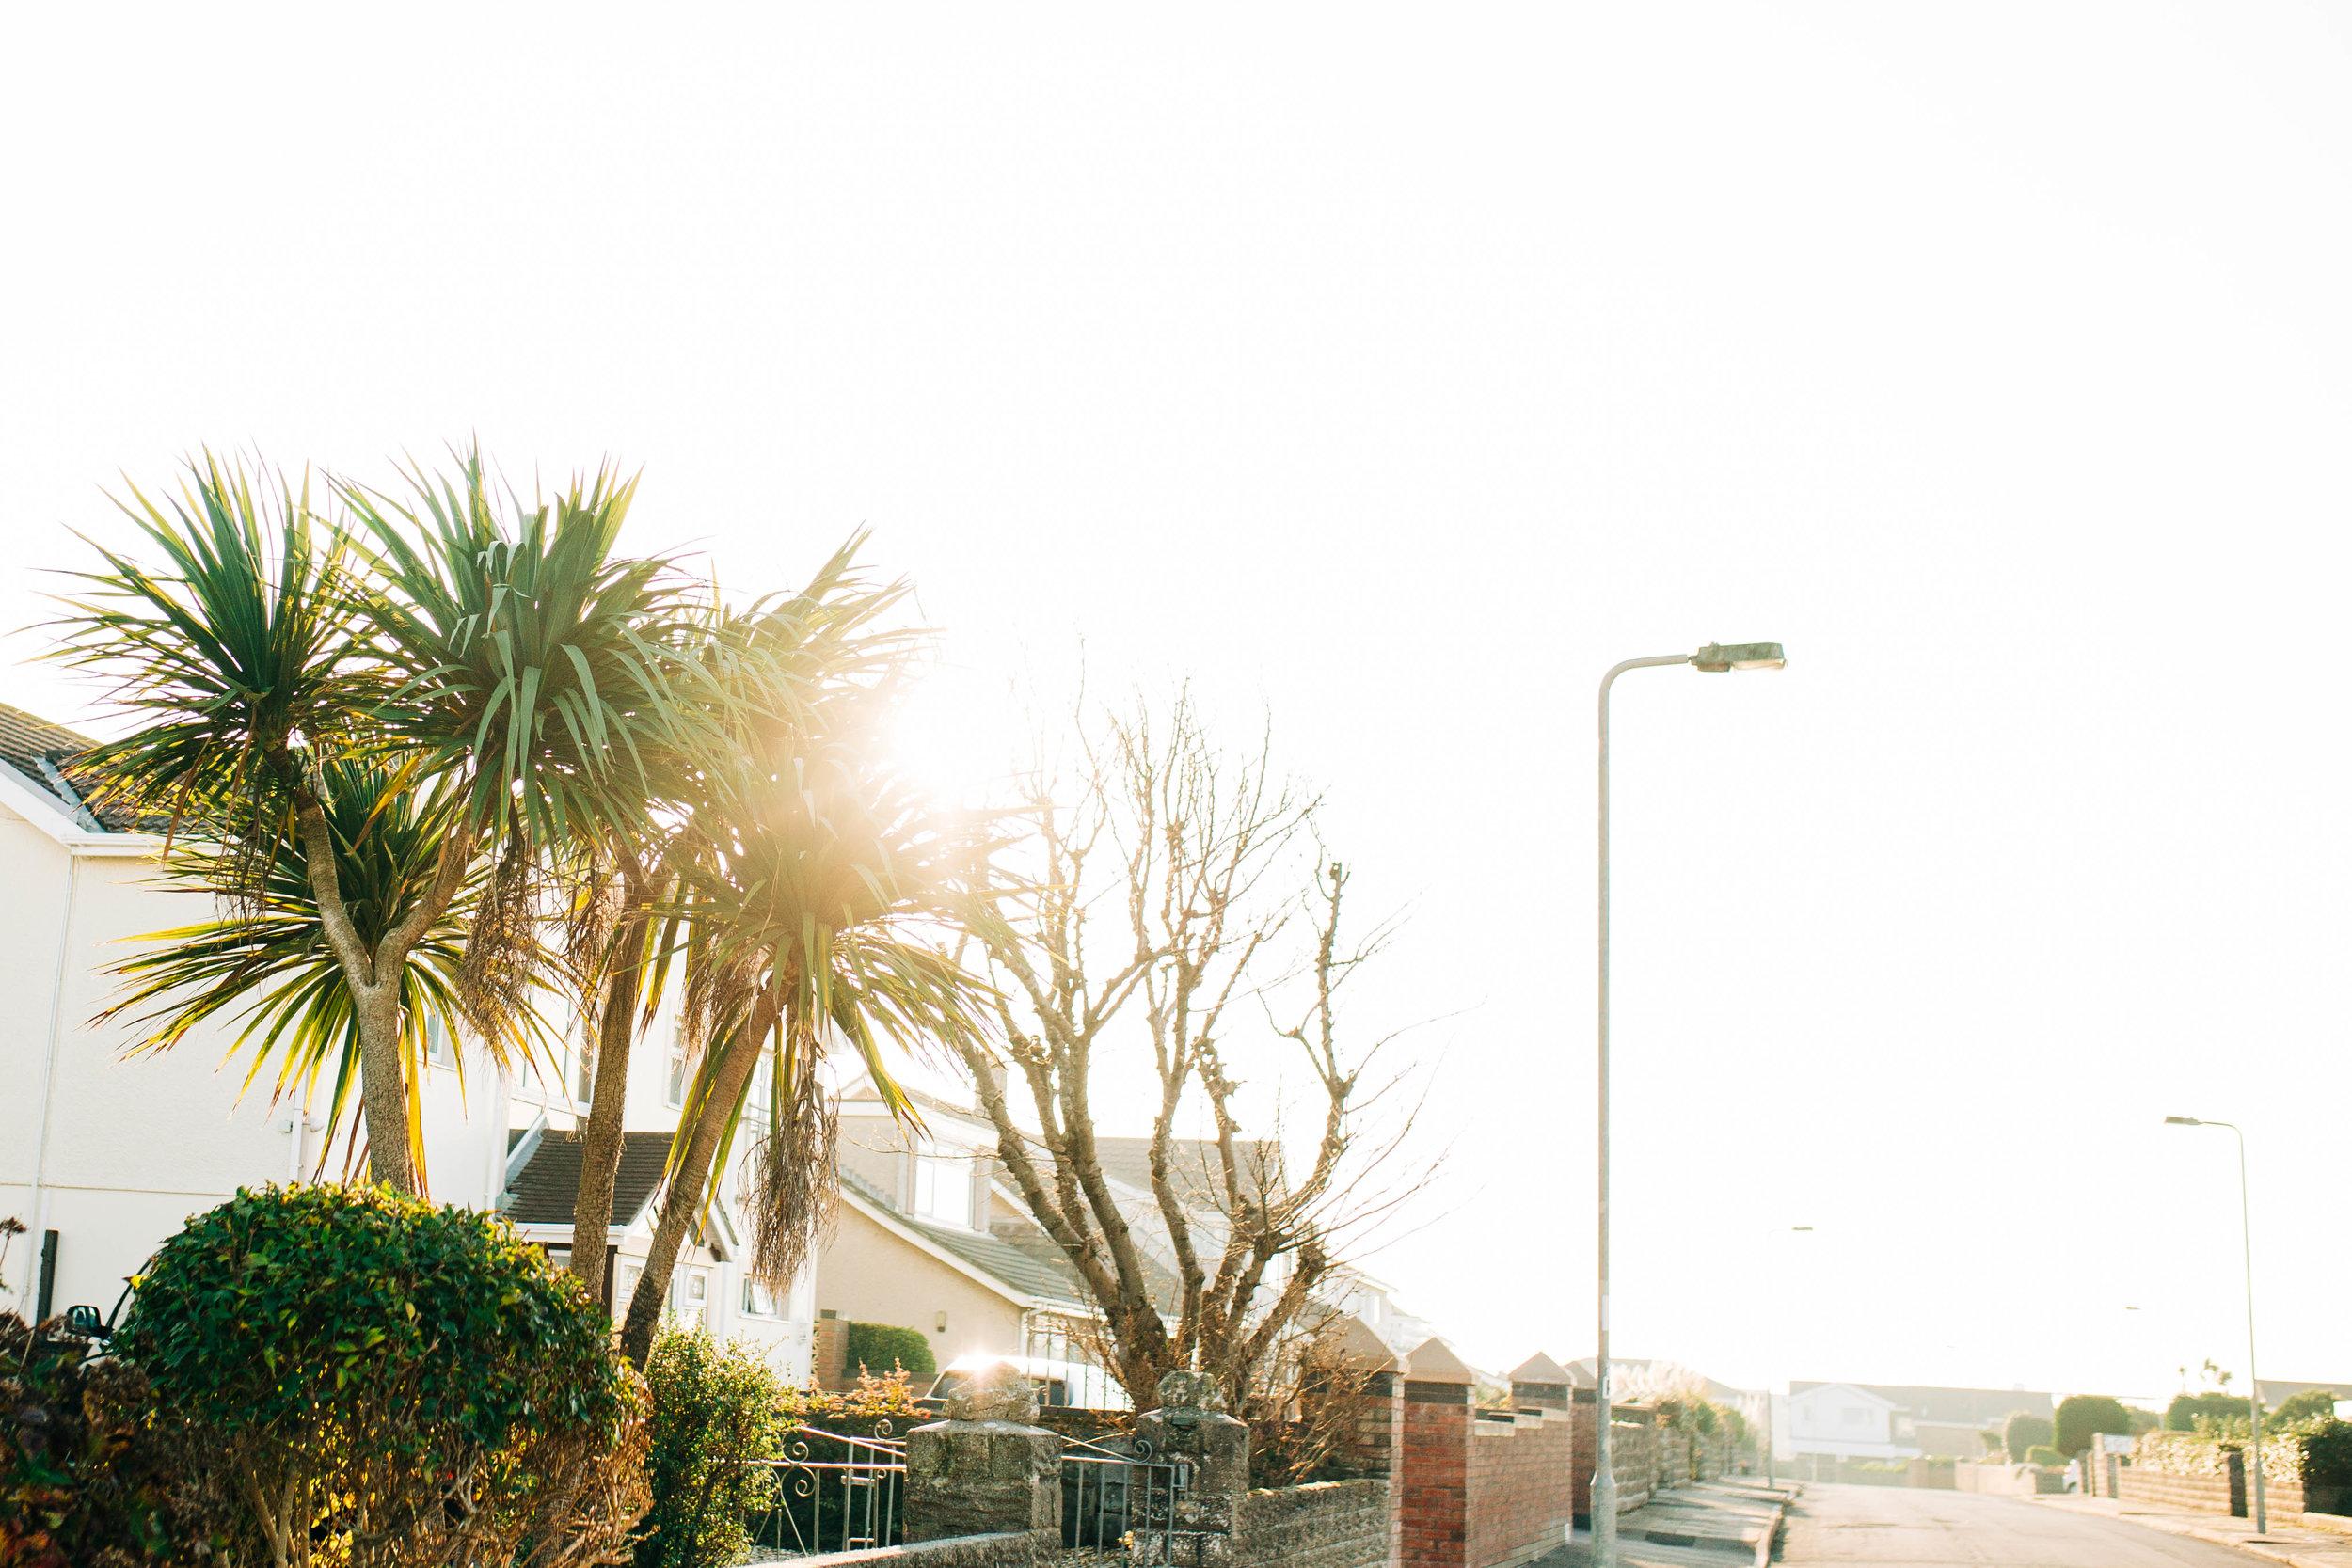 Alex_Sedgmond_Photography-Cardiff-SouthWales-PorthcawlRestbay-Surfing-EzraHames-12.jpg